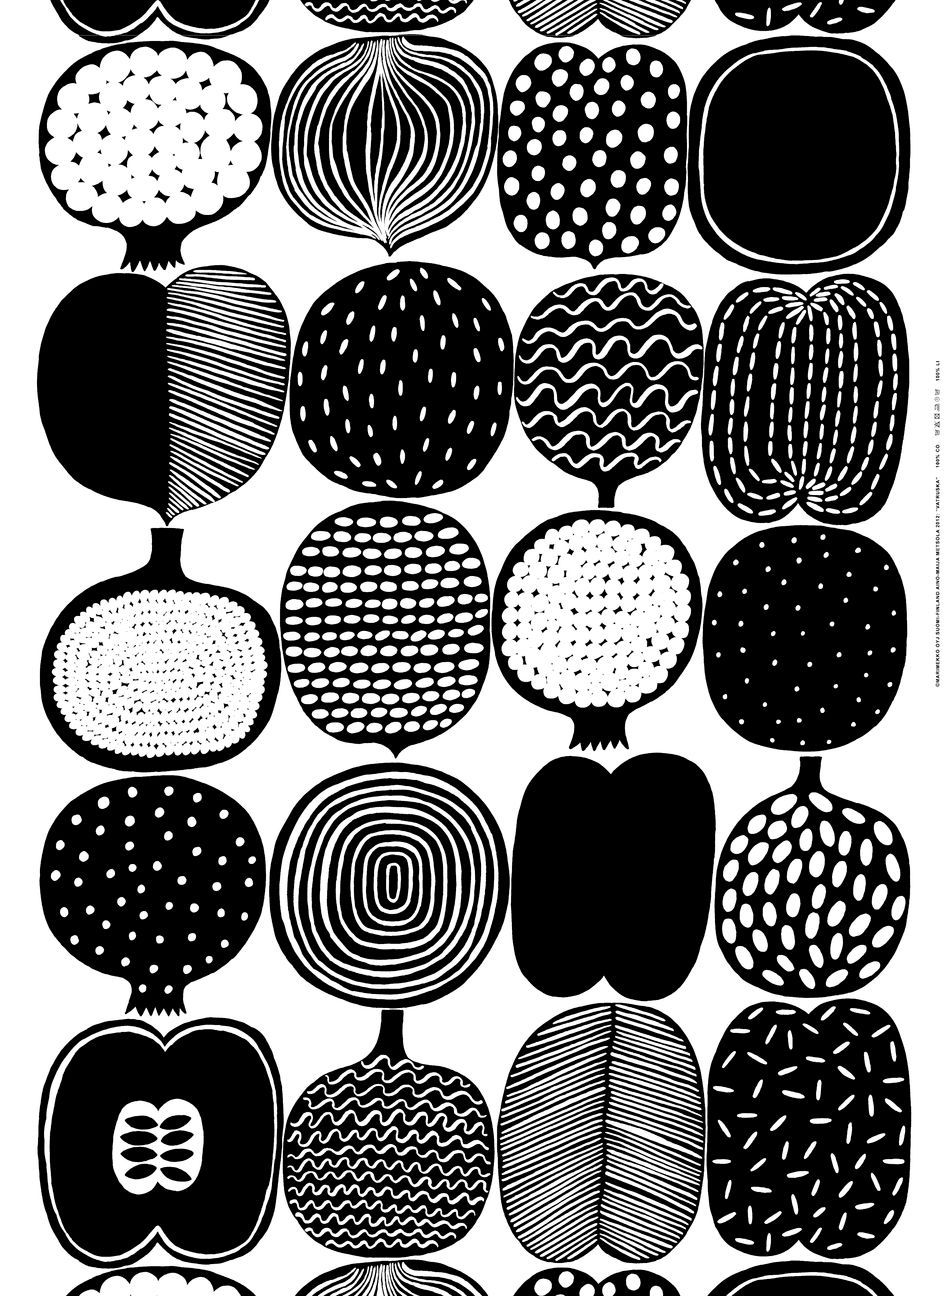 marimekko finnland meine kunst. Black Bedroom Furniture Sets. Home Design Ideas